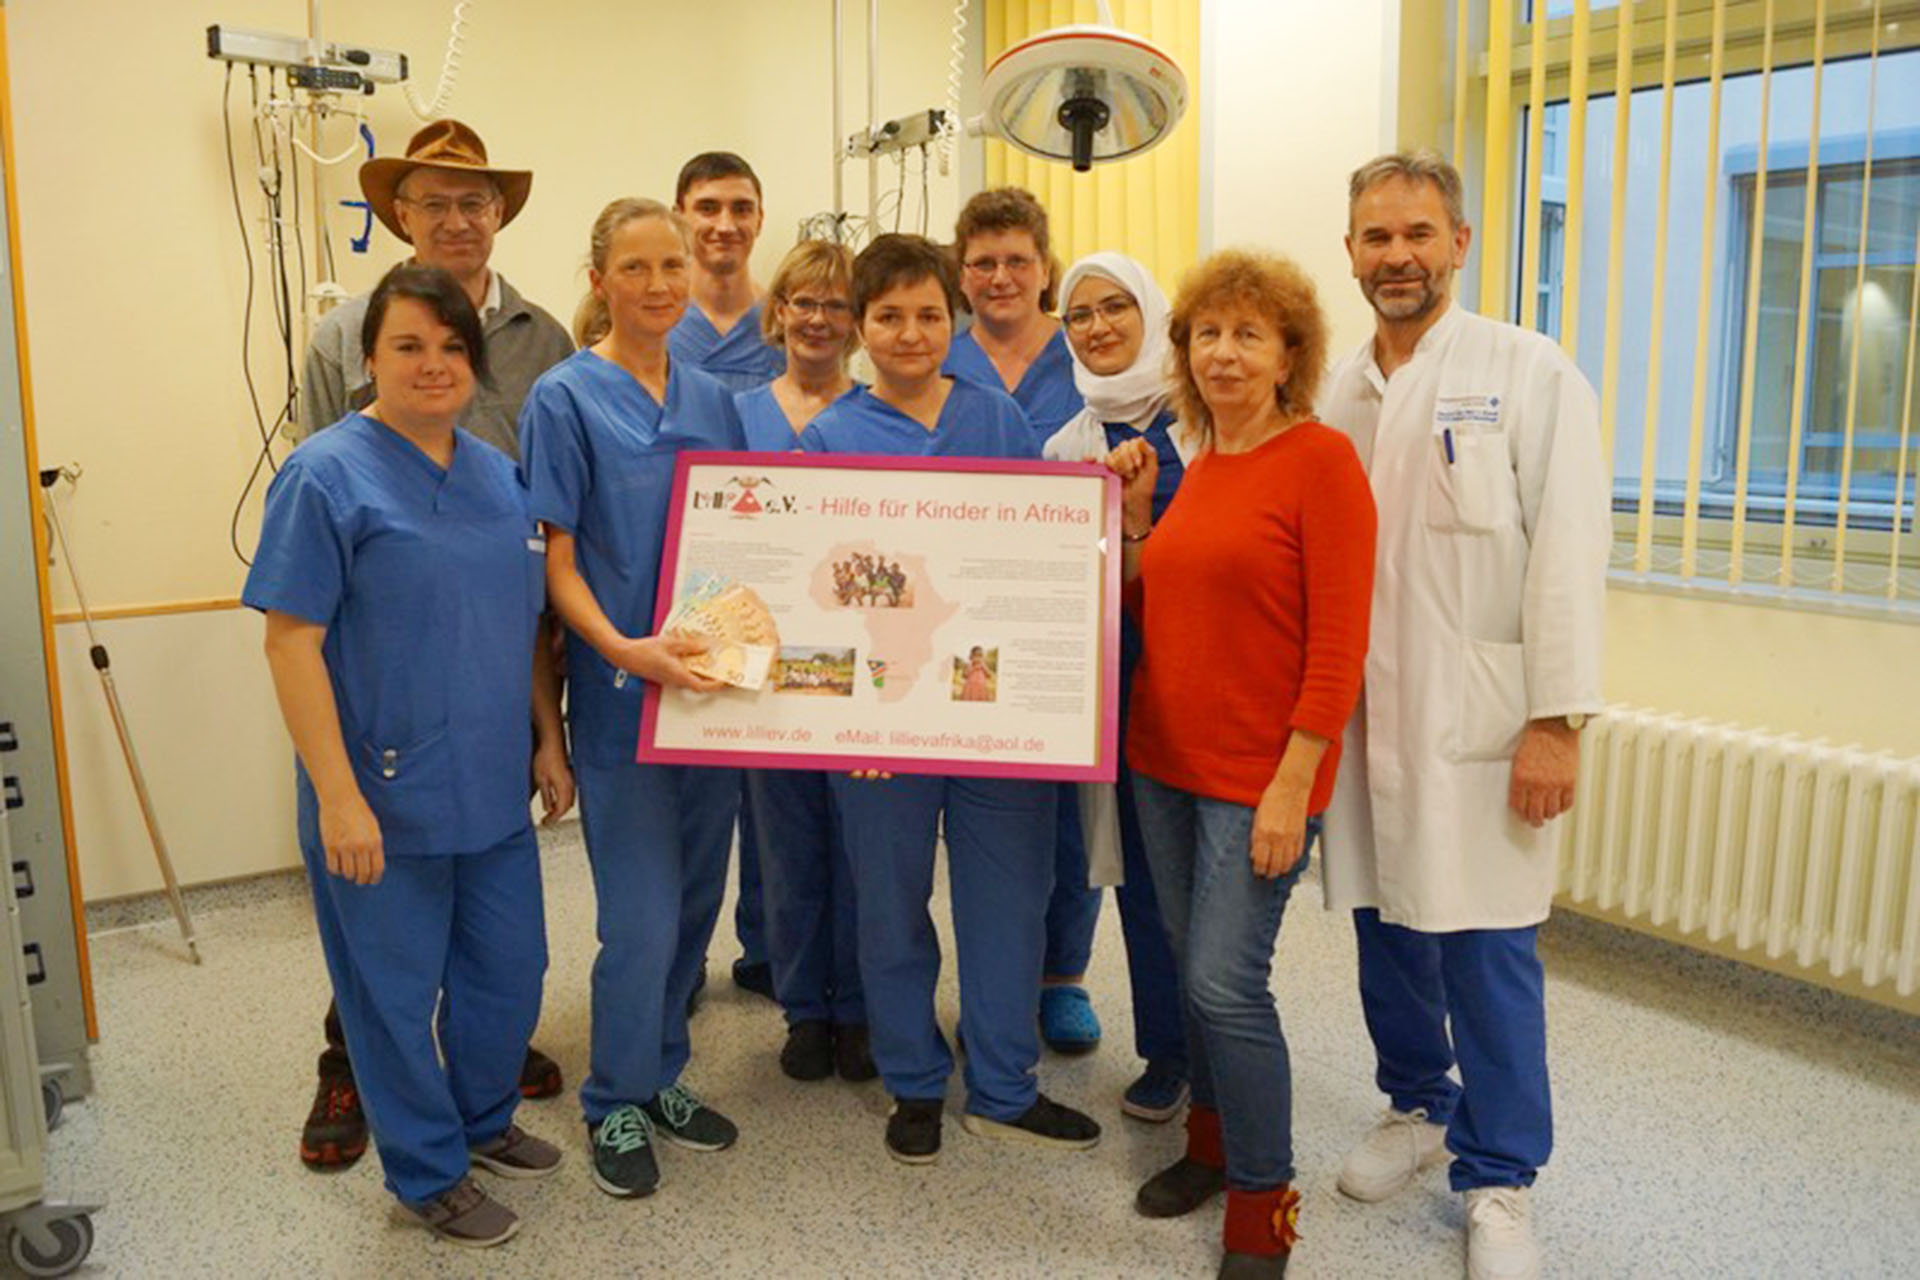 Kreiskrankenhaus Greiz: Lilli e.V. erhält 500-Euro-Spende